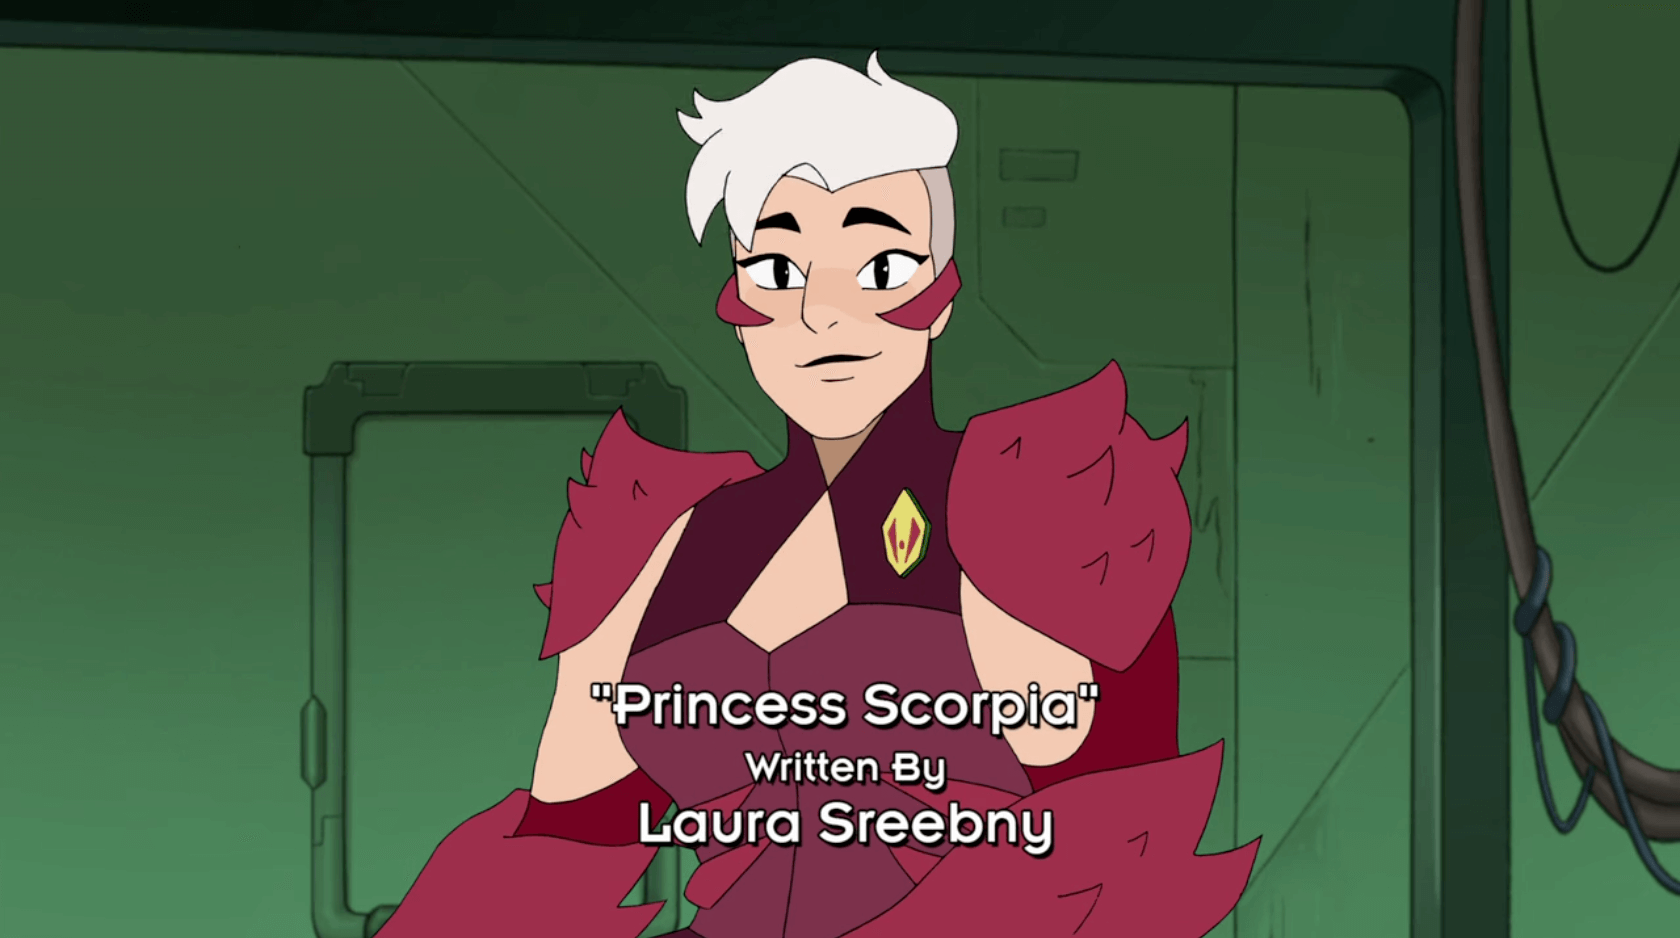 Princess Scorpia